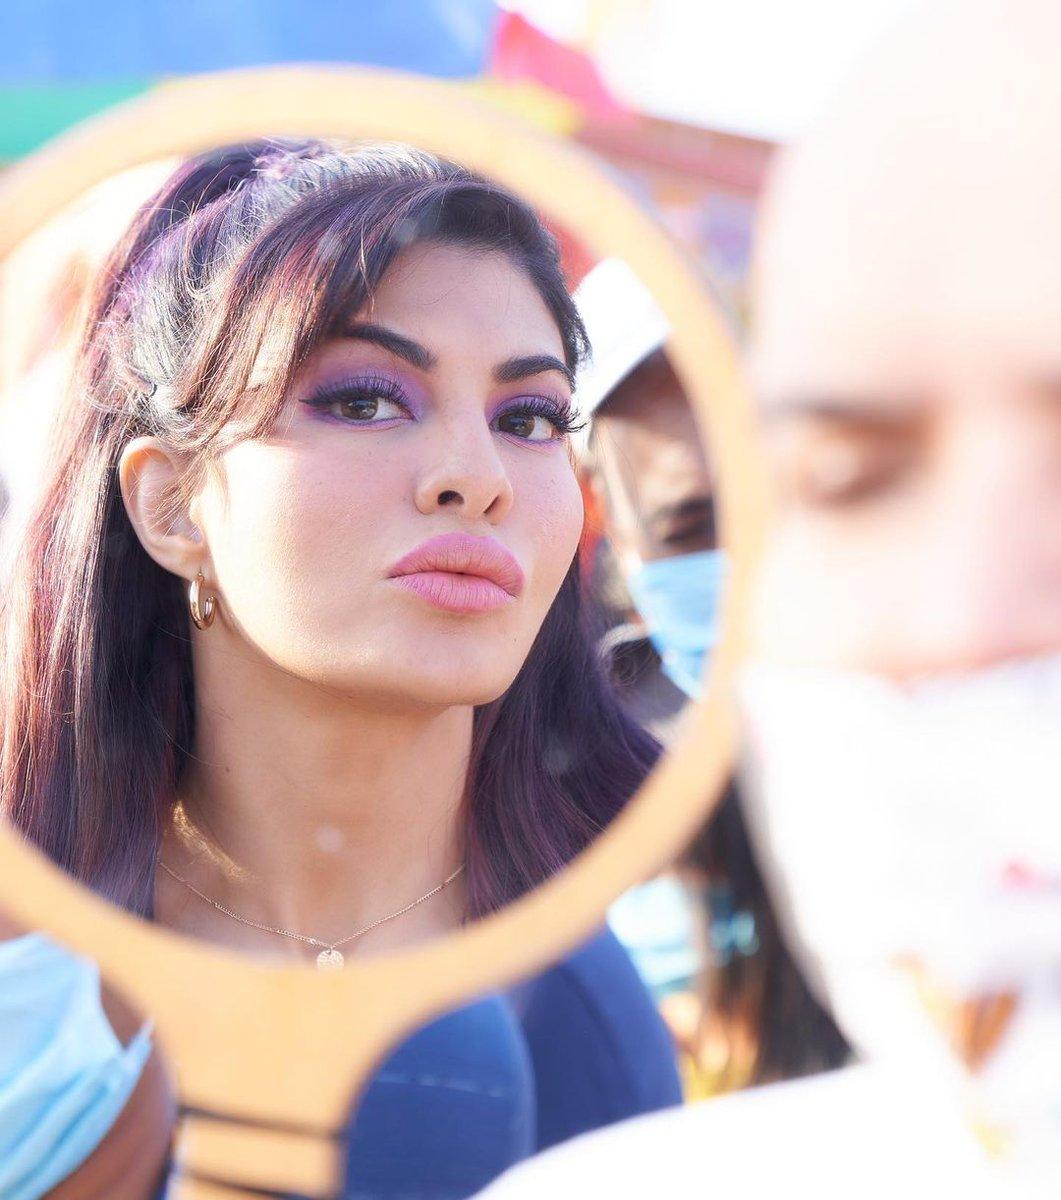 @Asli_Jacqueline today said  she had fun playing her char in #SajidNadiadwala  #Bachchan Pandey. @NGEMovies @akshaykumar @WardaNadiadwala @farhad_samji @shaanmuofficial @kritisanon #bollywoodnews #Entertainment #jacquelinefernandez #AkshayKumar